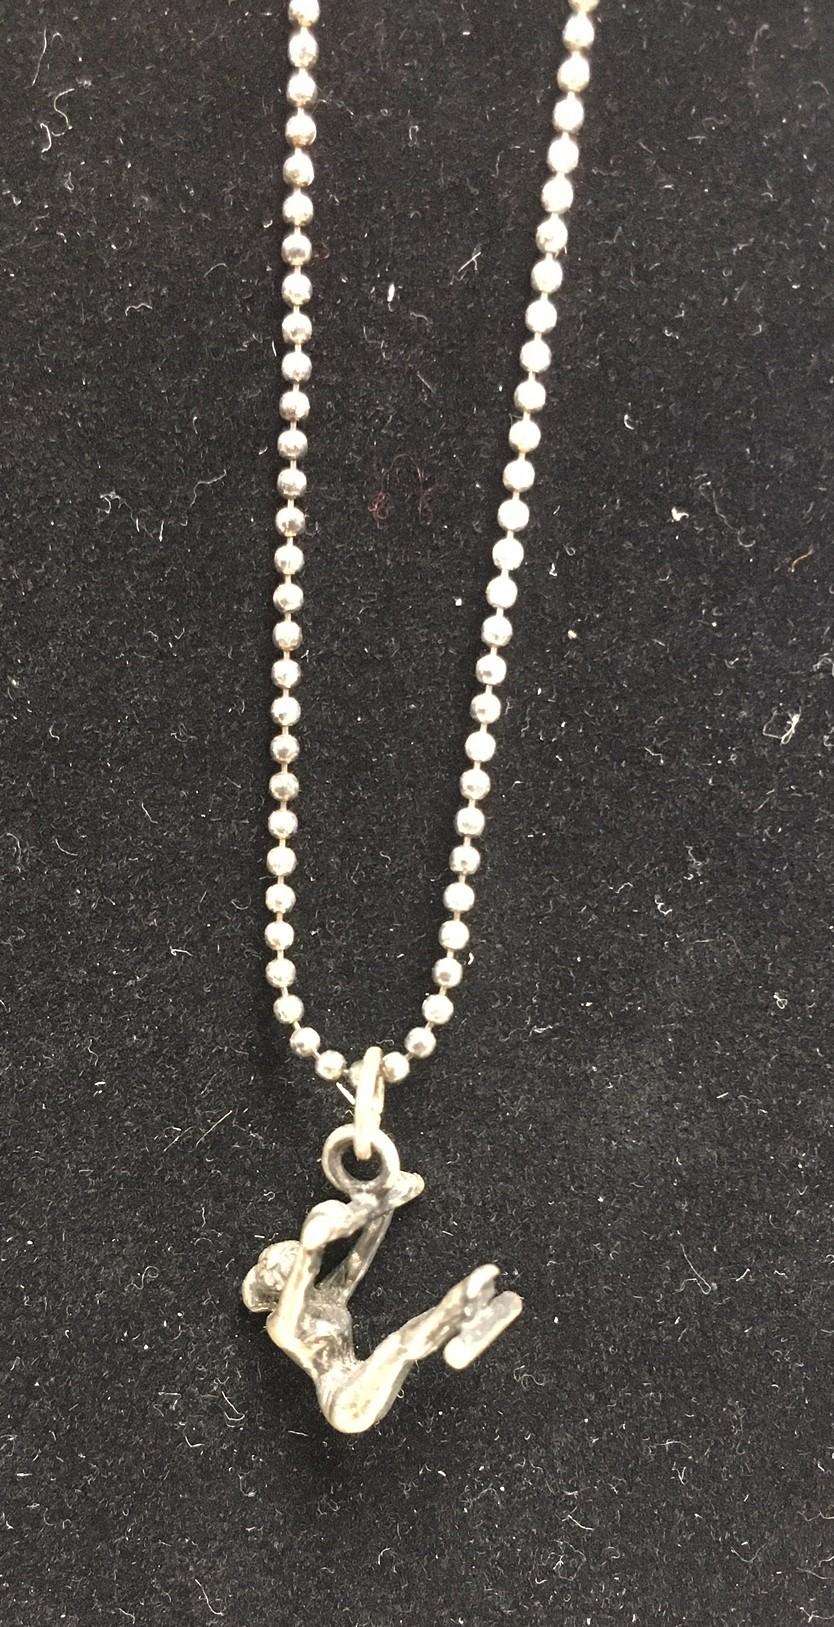 Barry's Gymnast Necklace